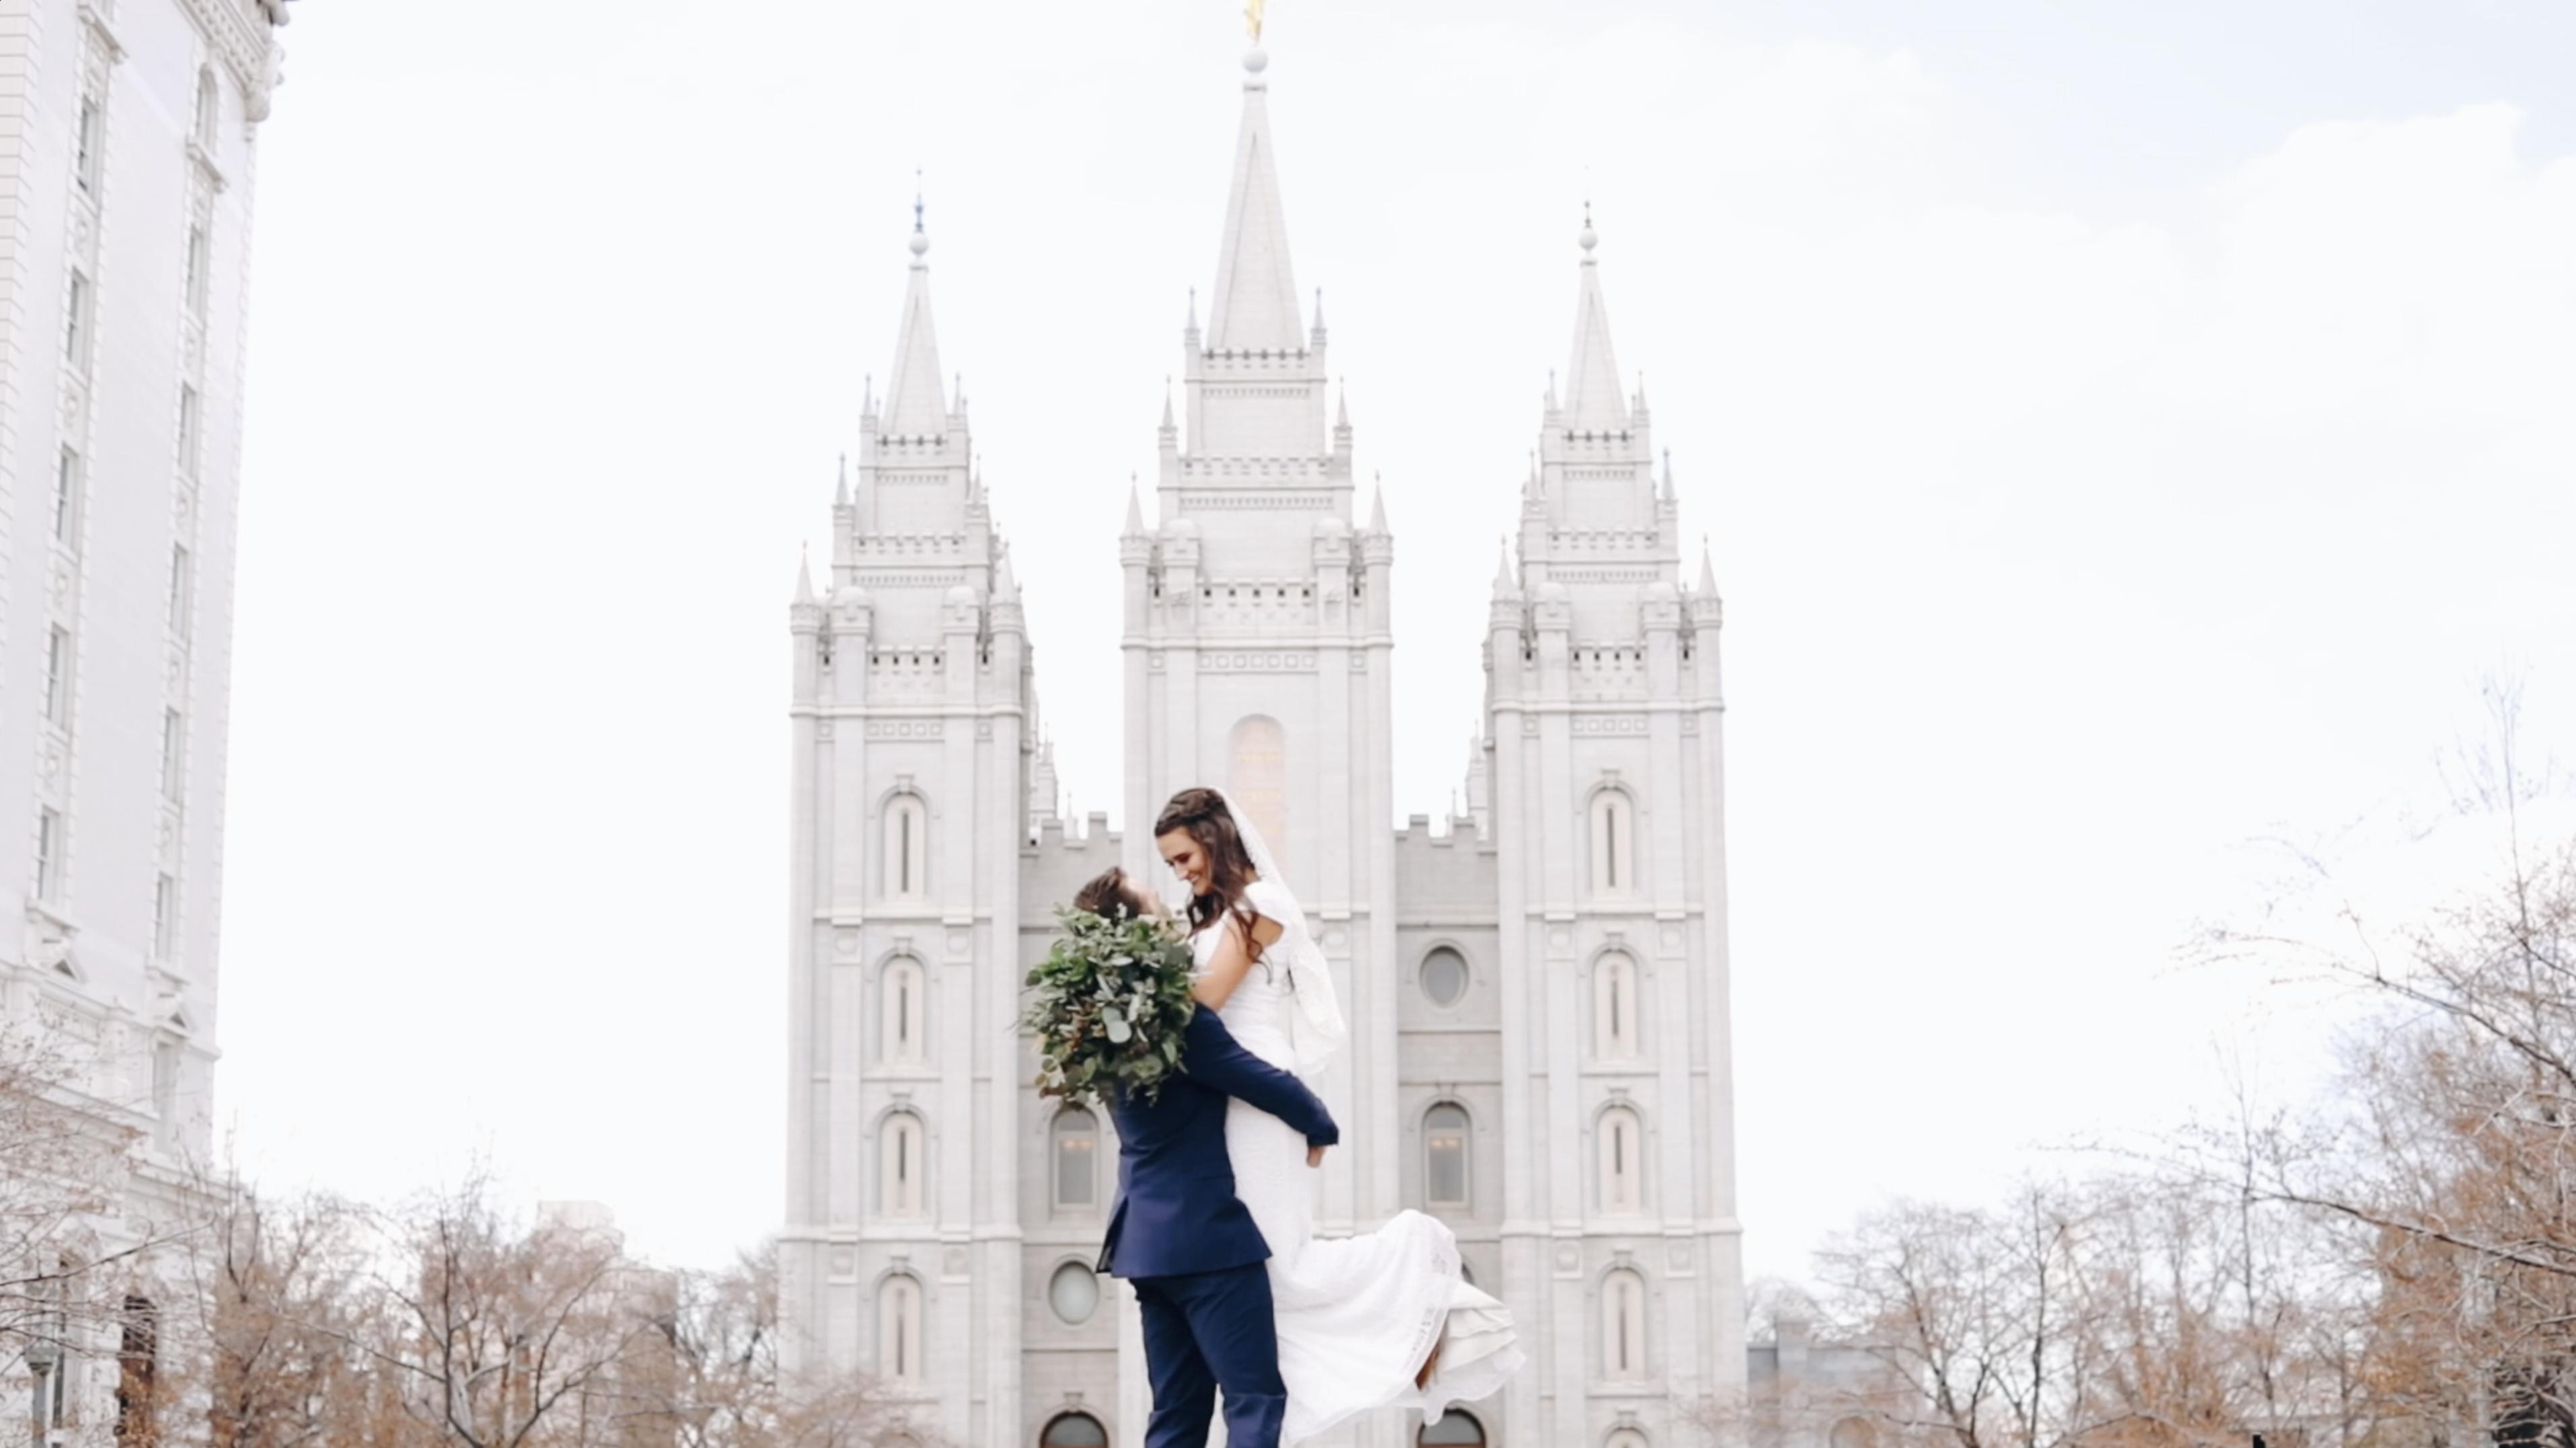 Ethan + Paige | Alpine, Utah | Knot & Pine